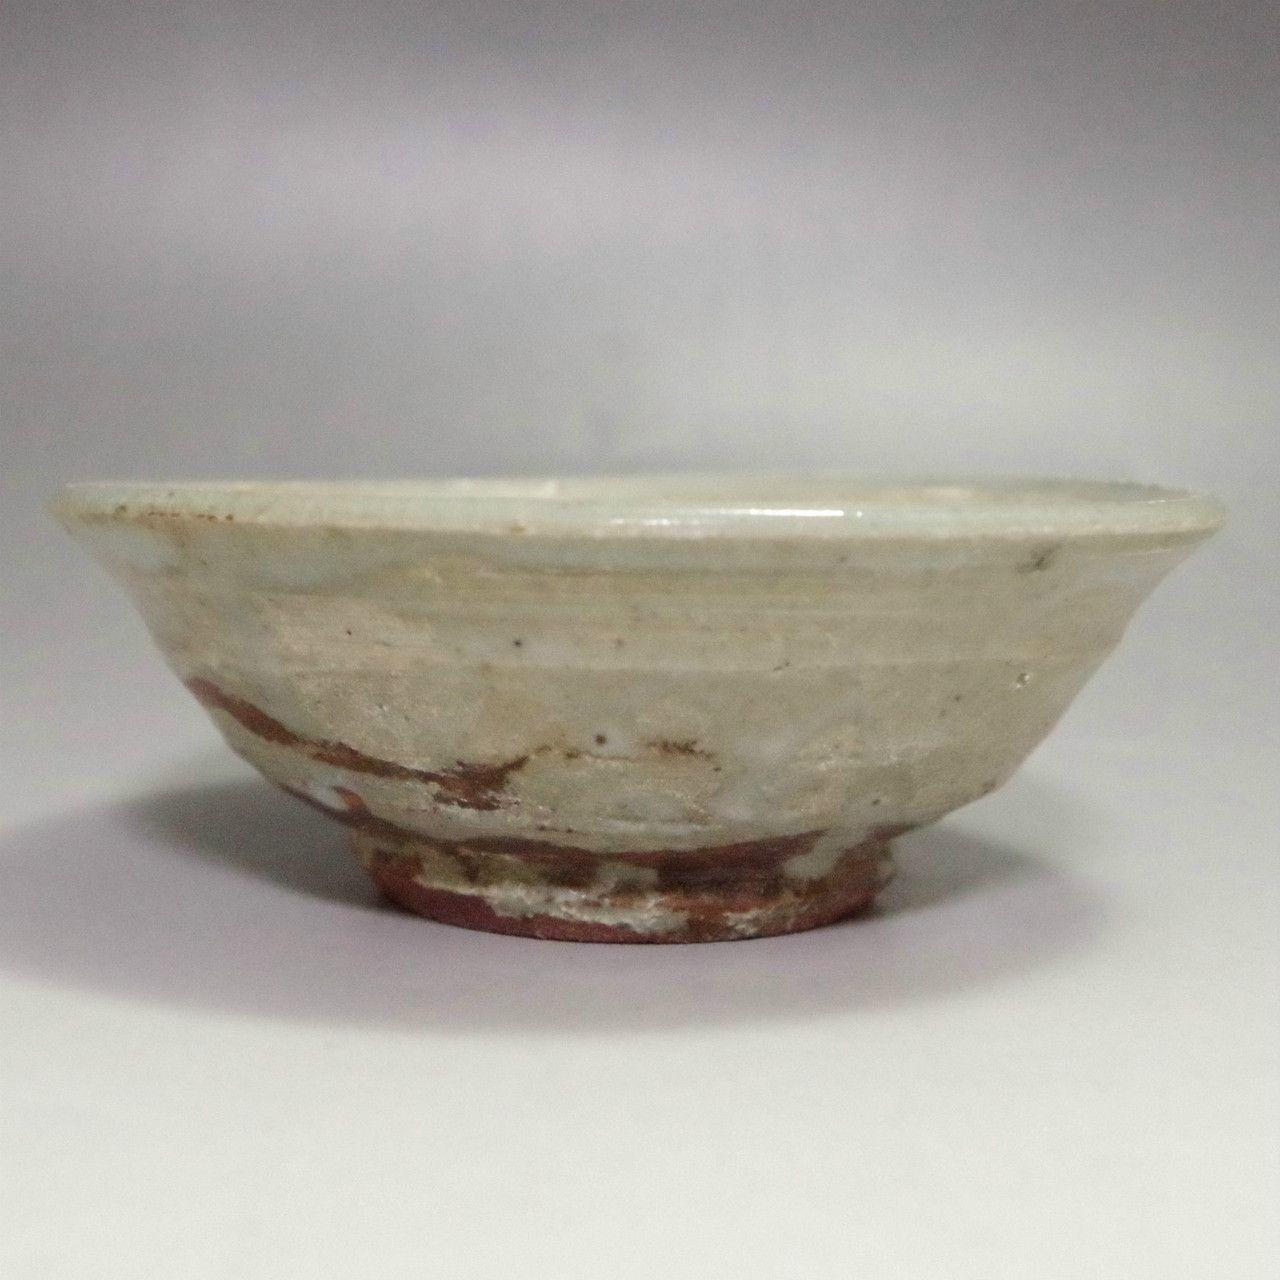 Small Antique Chinese Longquan Celadon Bowl #1899 - CHANOYU